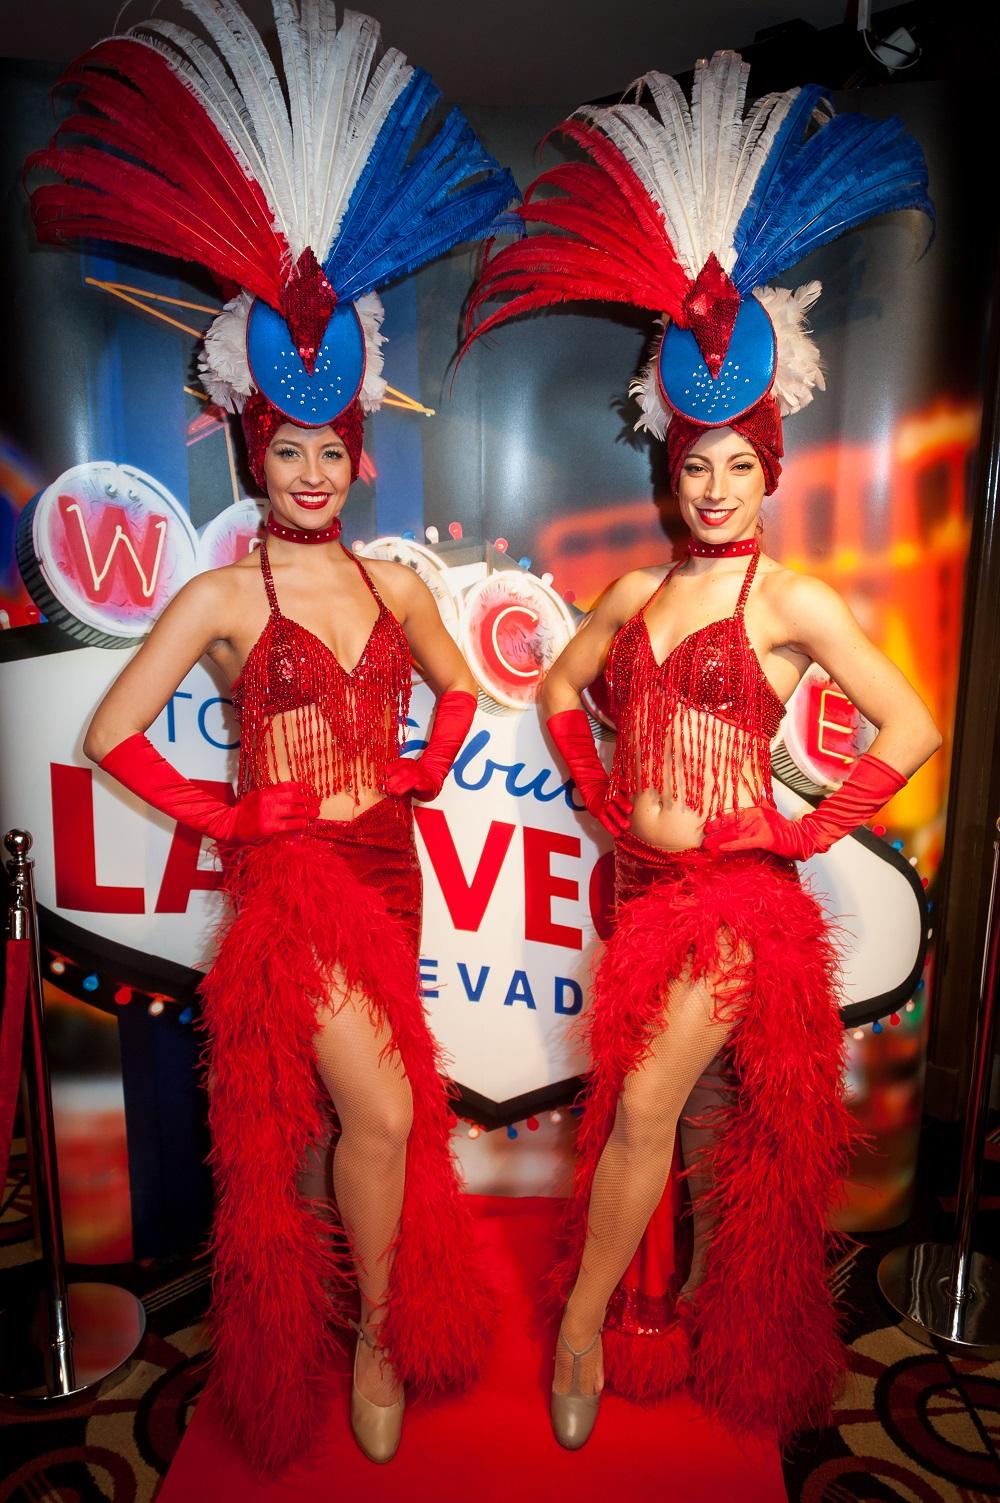 Vegas Show Girls - Event Dancers  Dancers For Hire Uk-6641